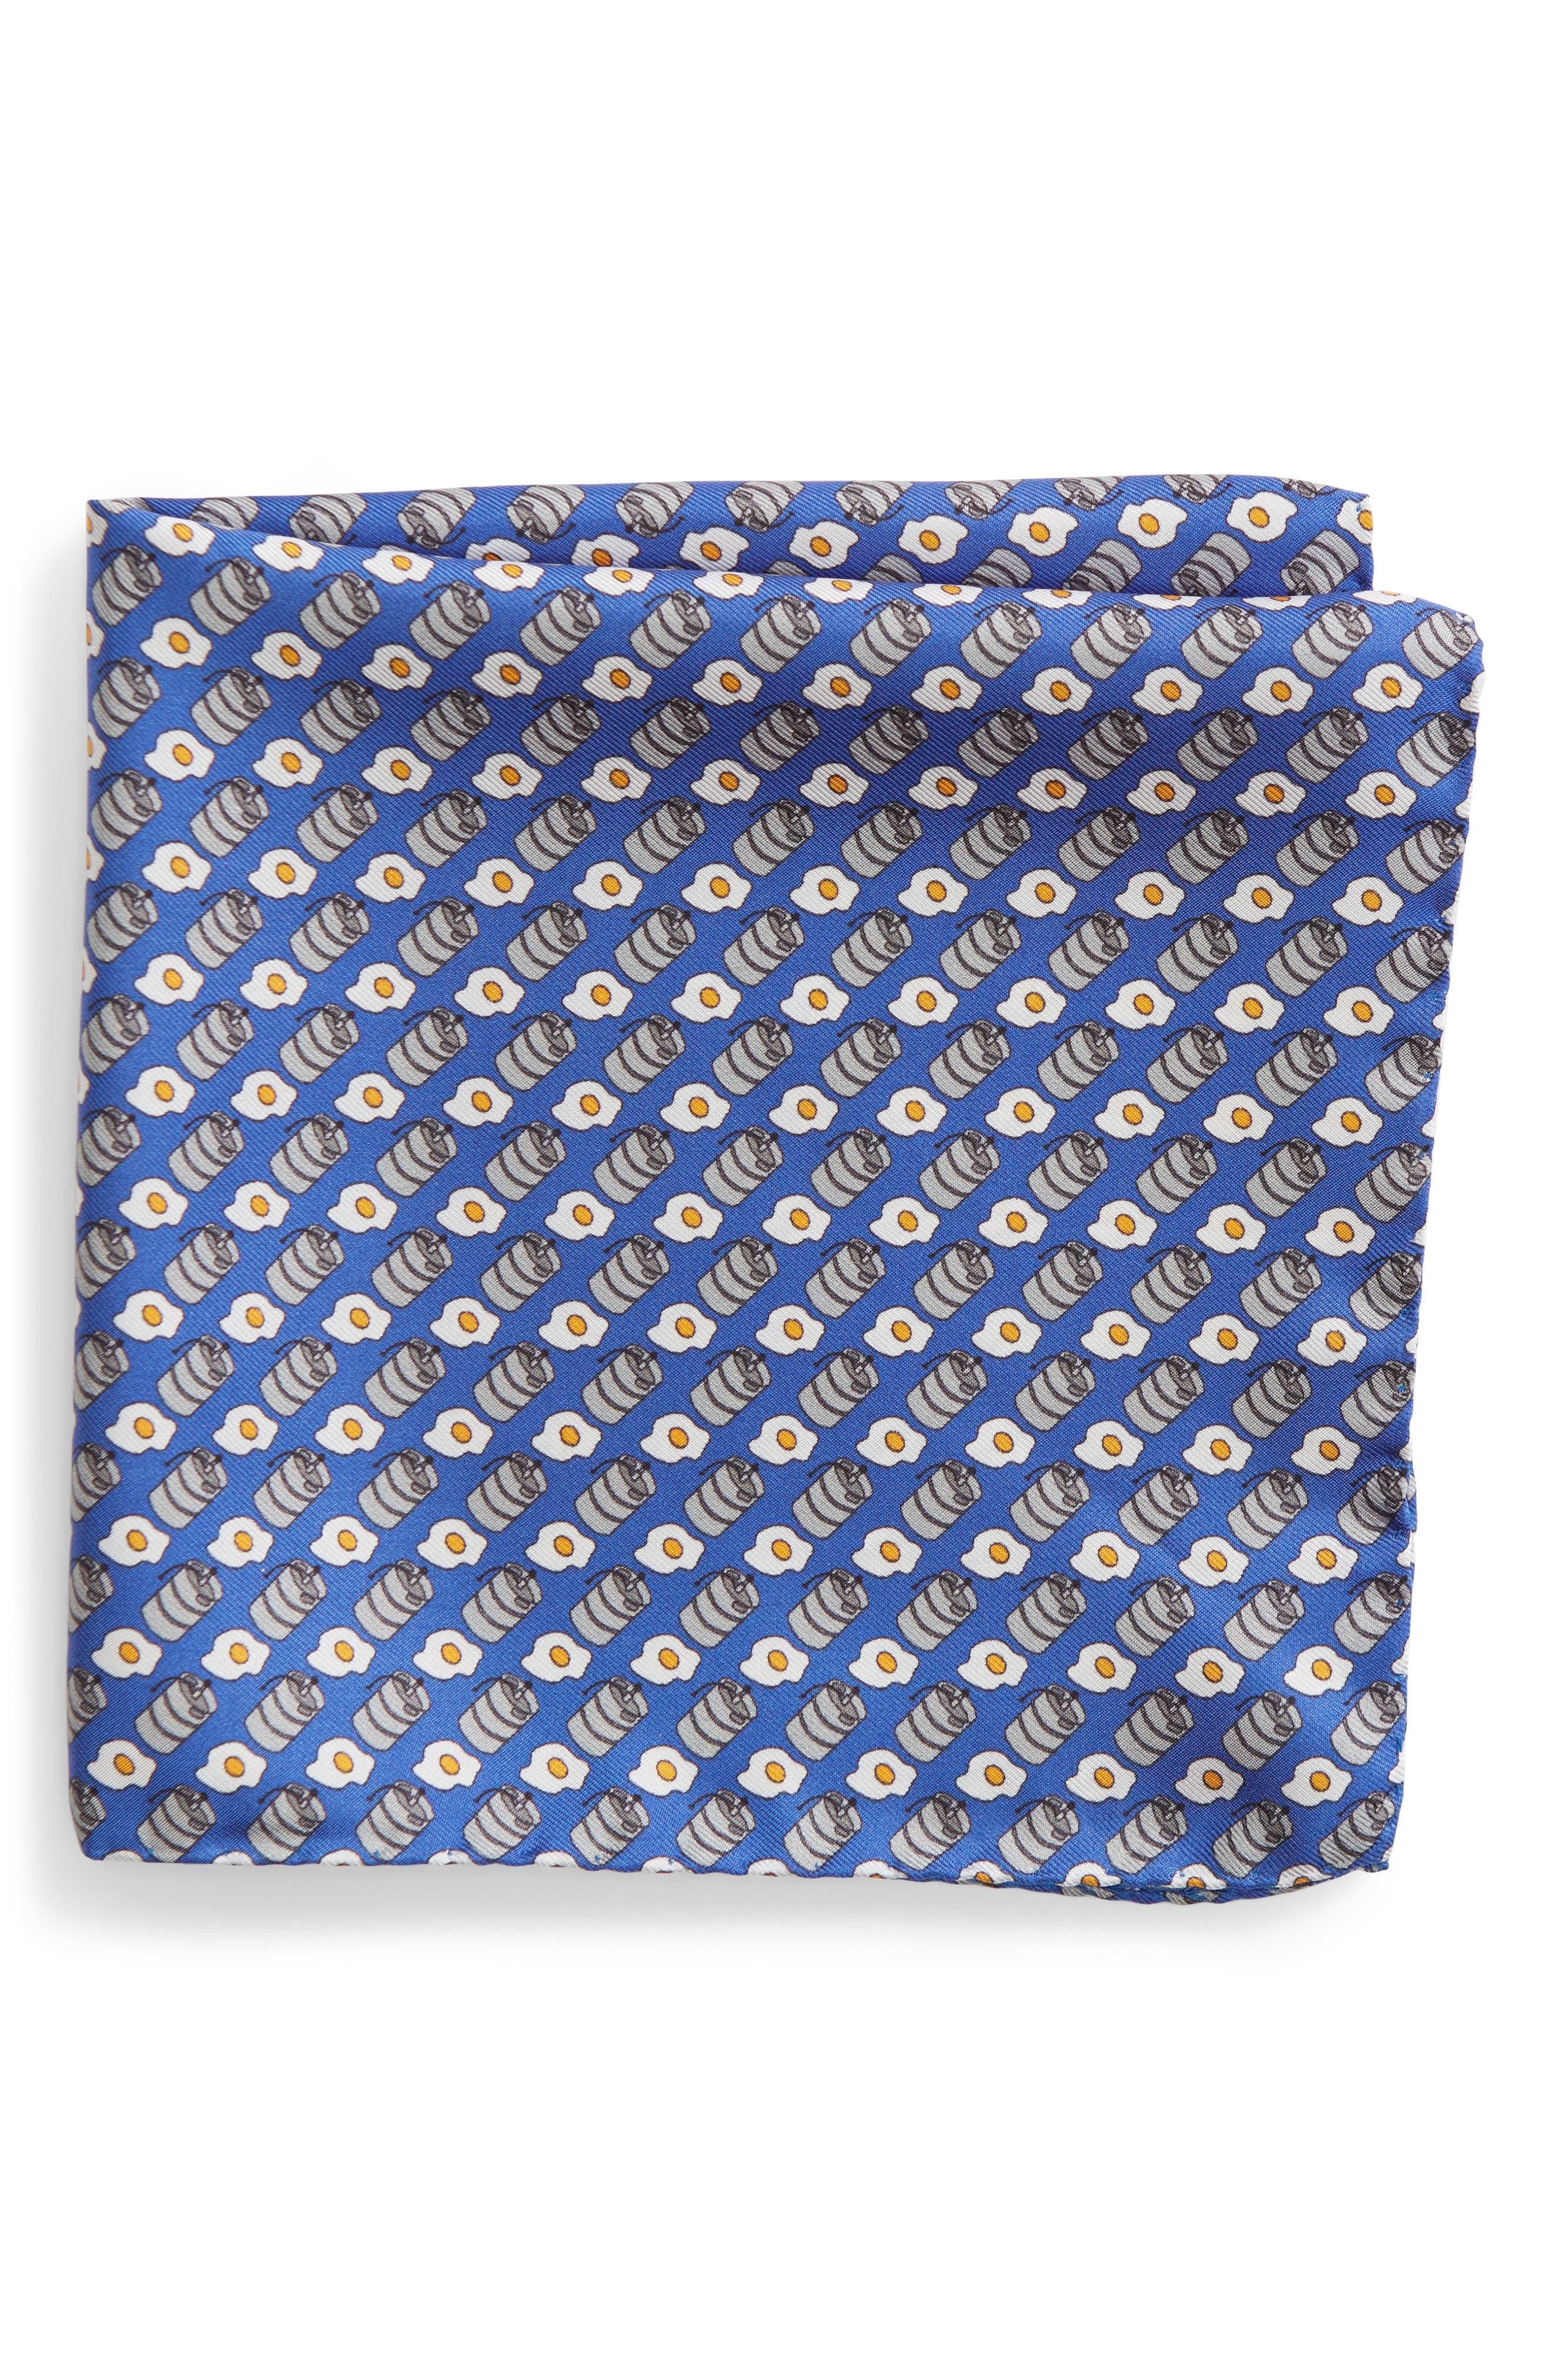 Kegs & Eggs Silk Pocket Square,                             Main thumbnail 1, color,                             Blue